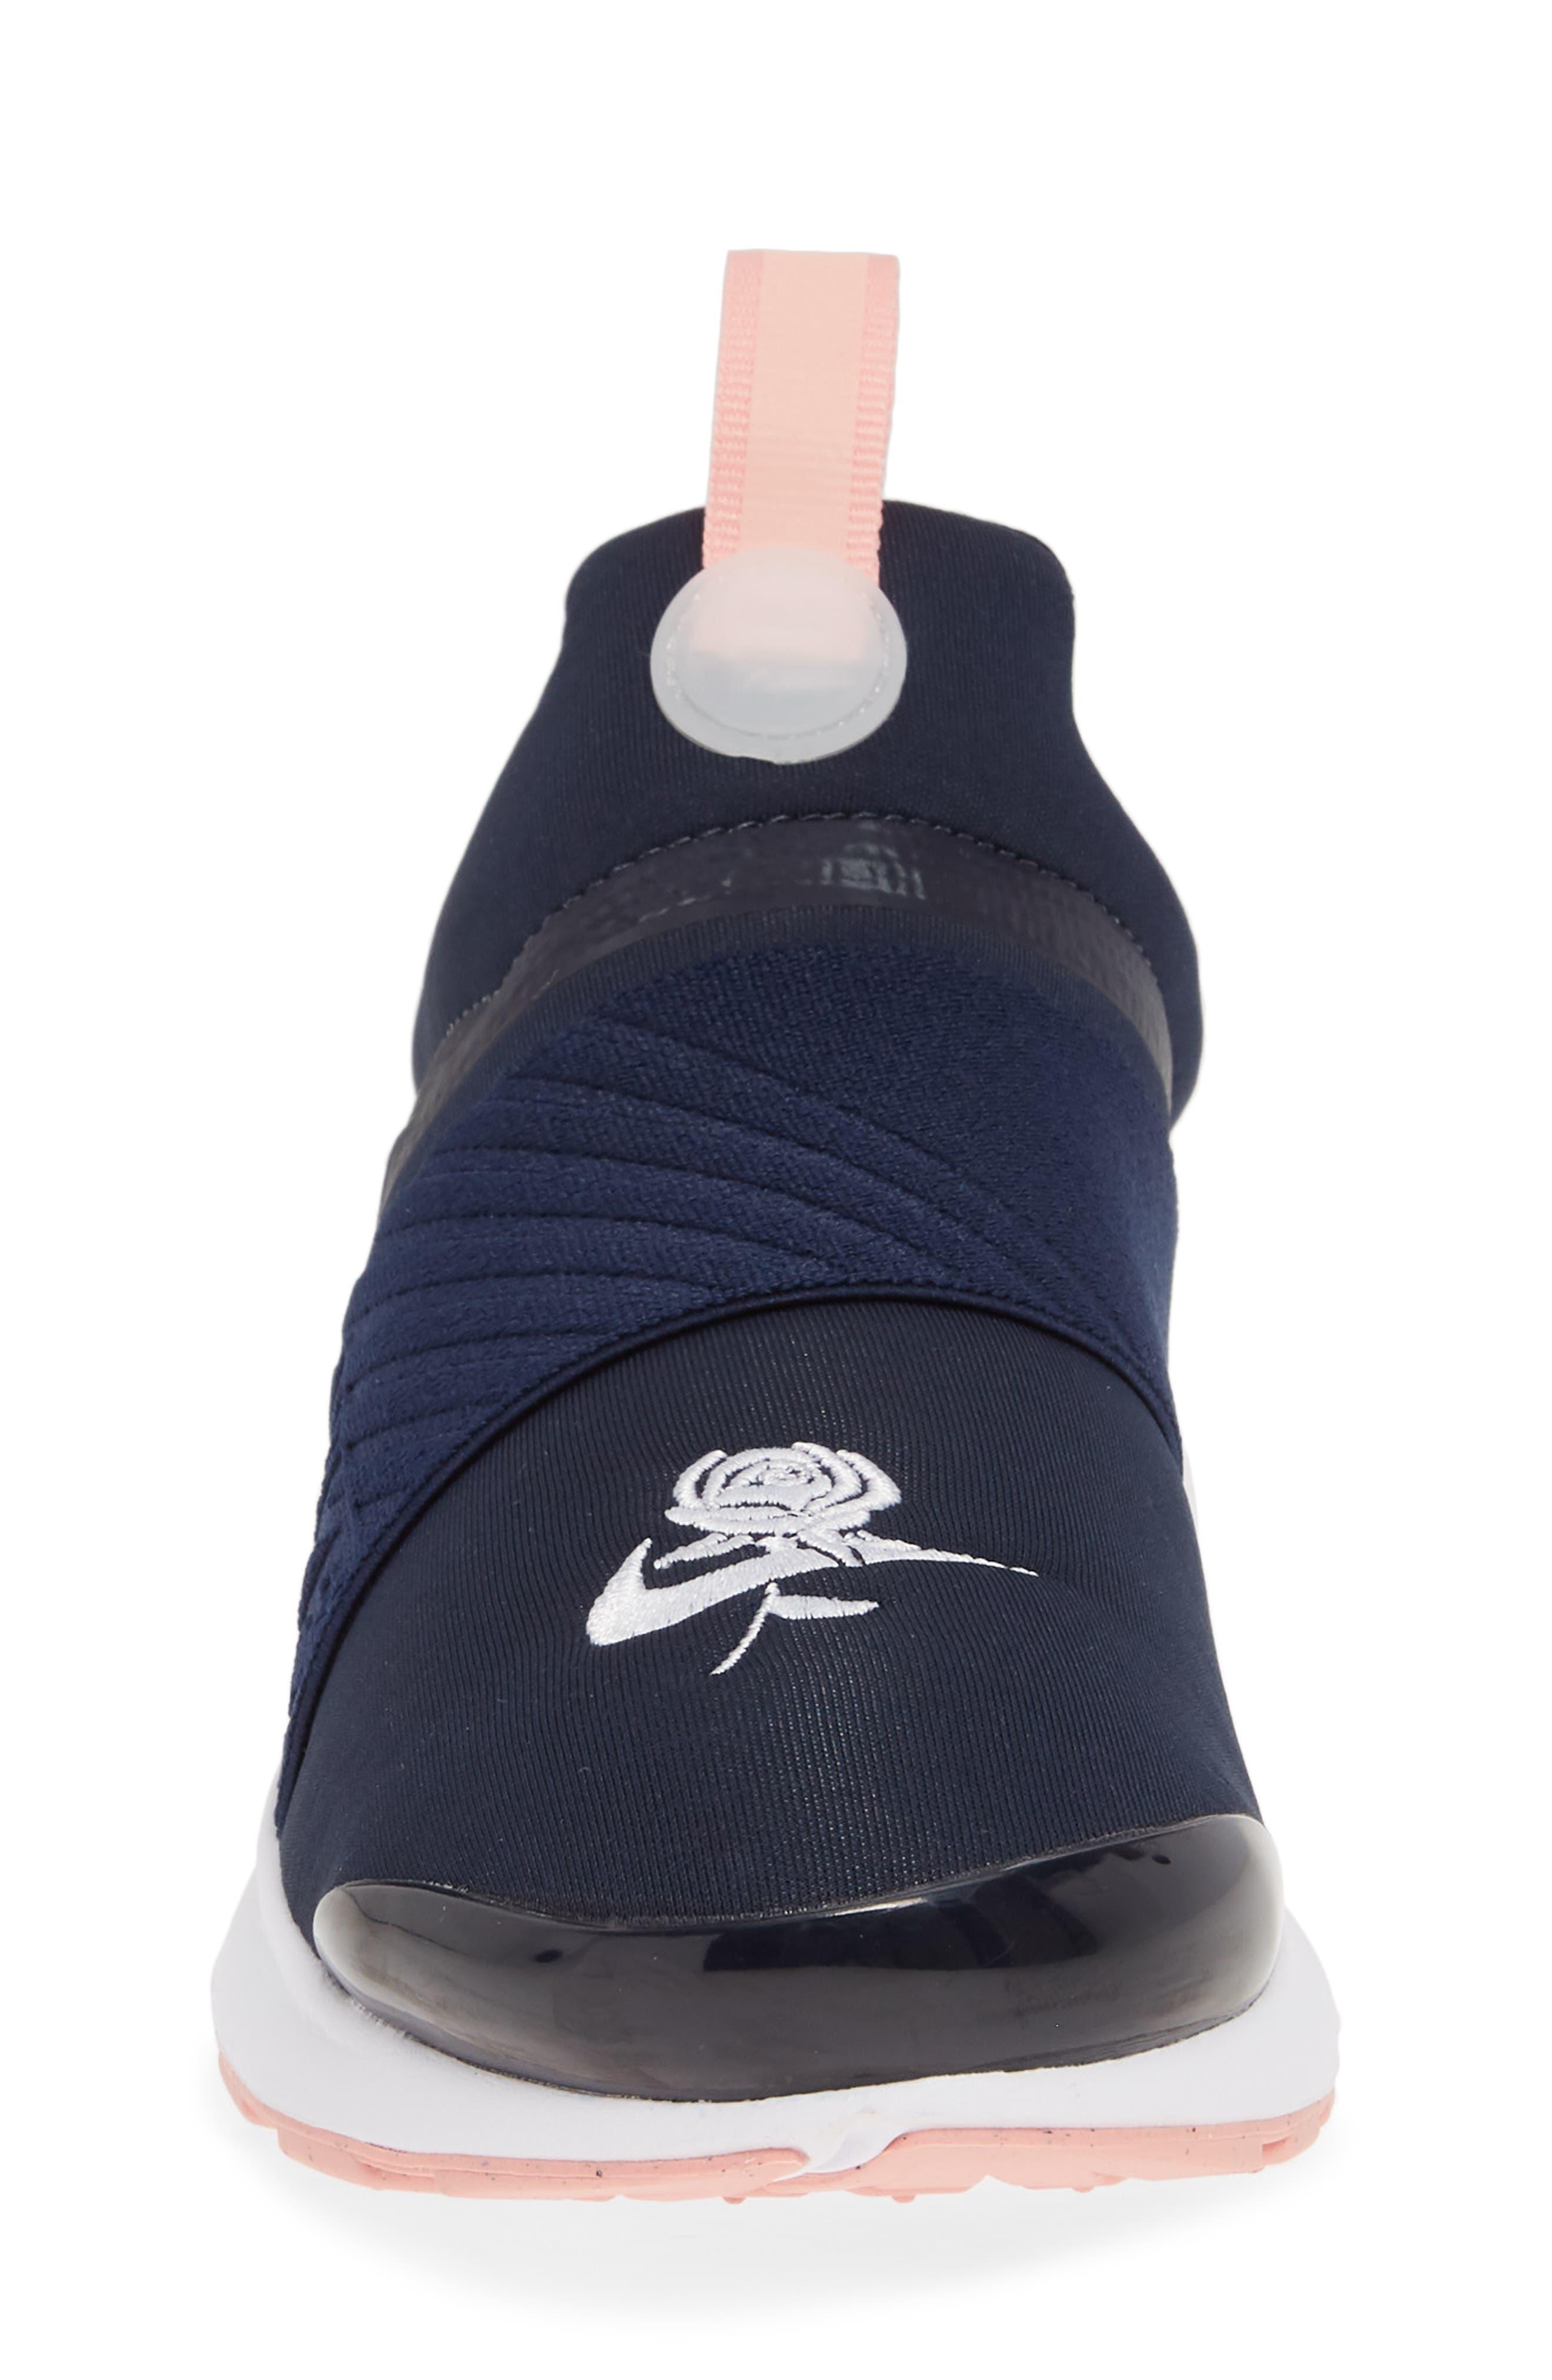 NIKE, Presto Extreme VDAY Sneaker, Alternate thumbnail 4, color, OBSIDIAN/ BLEACHED CORAL-WHITE